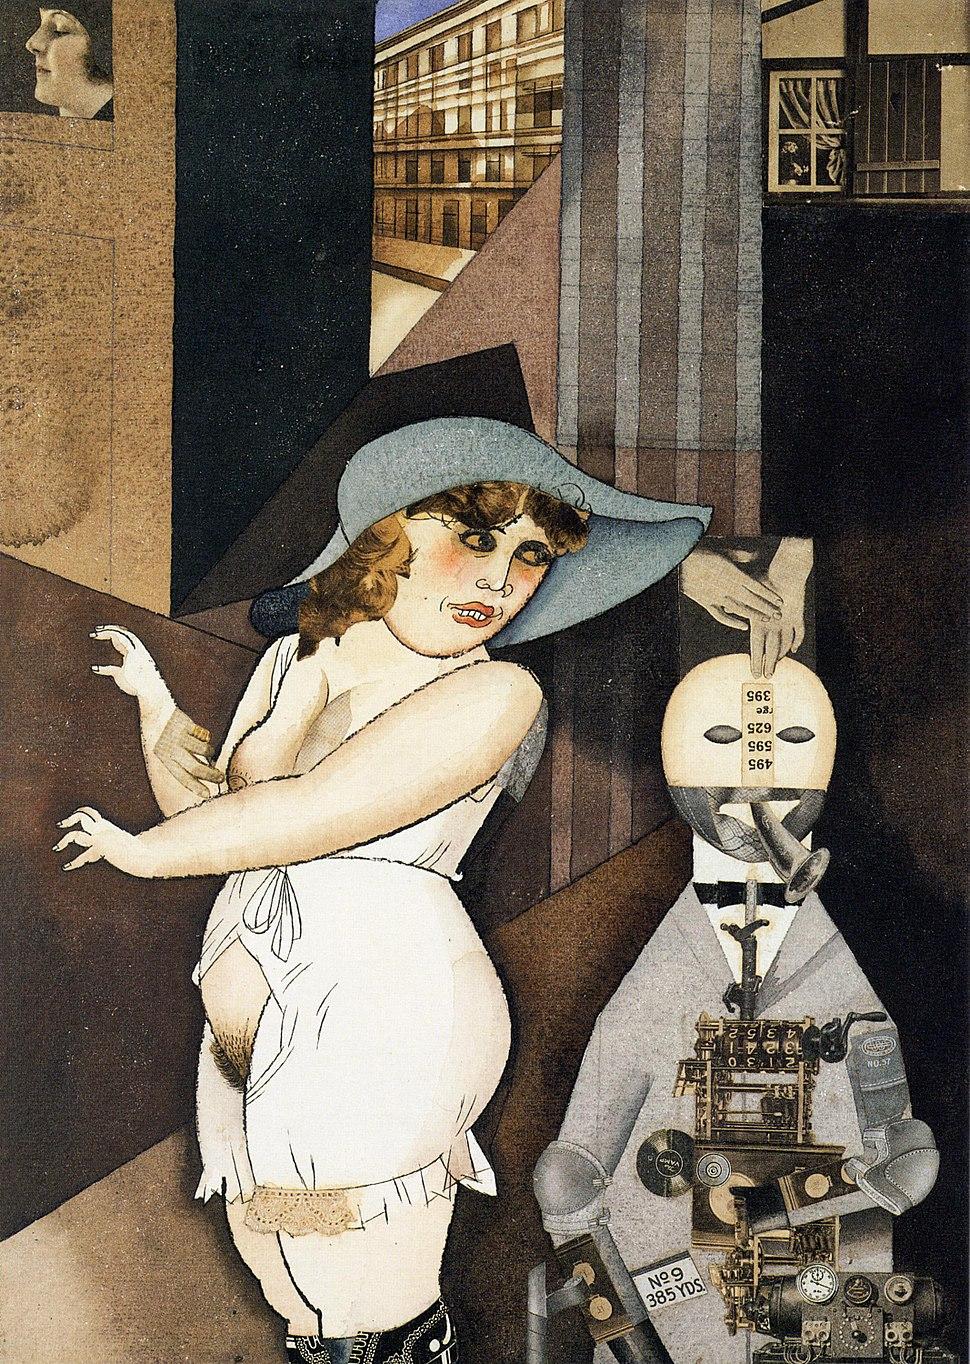 George Grosz, Daum marries her pedantic automaton George in May 1920, John Heartfield is very glad of it, Berlinische Galerie